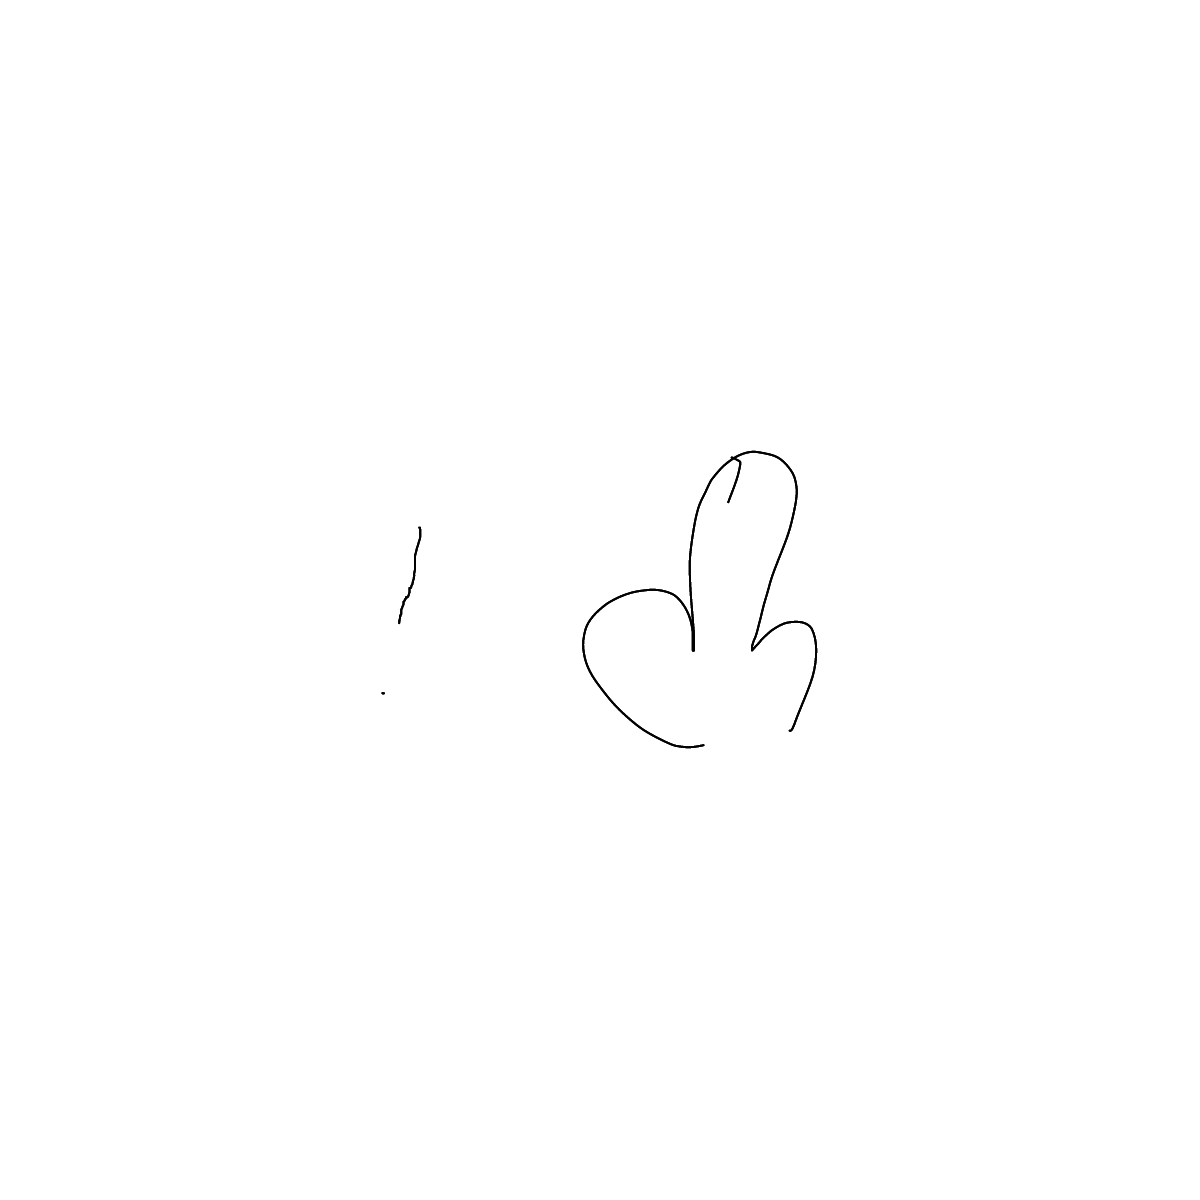 BAAAM drawing#5083 lat:-41.4425582885742200lng: 147.1378021240234400